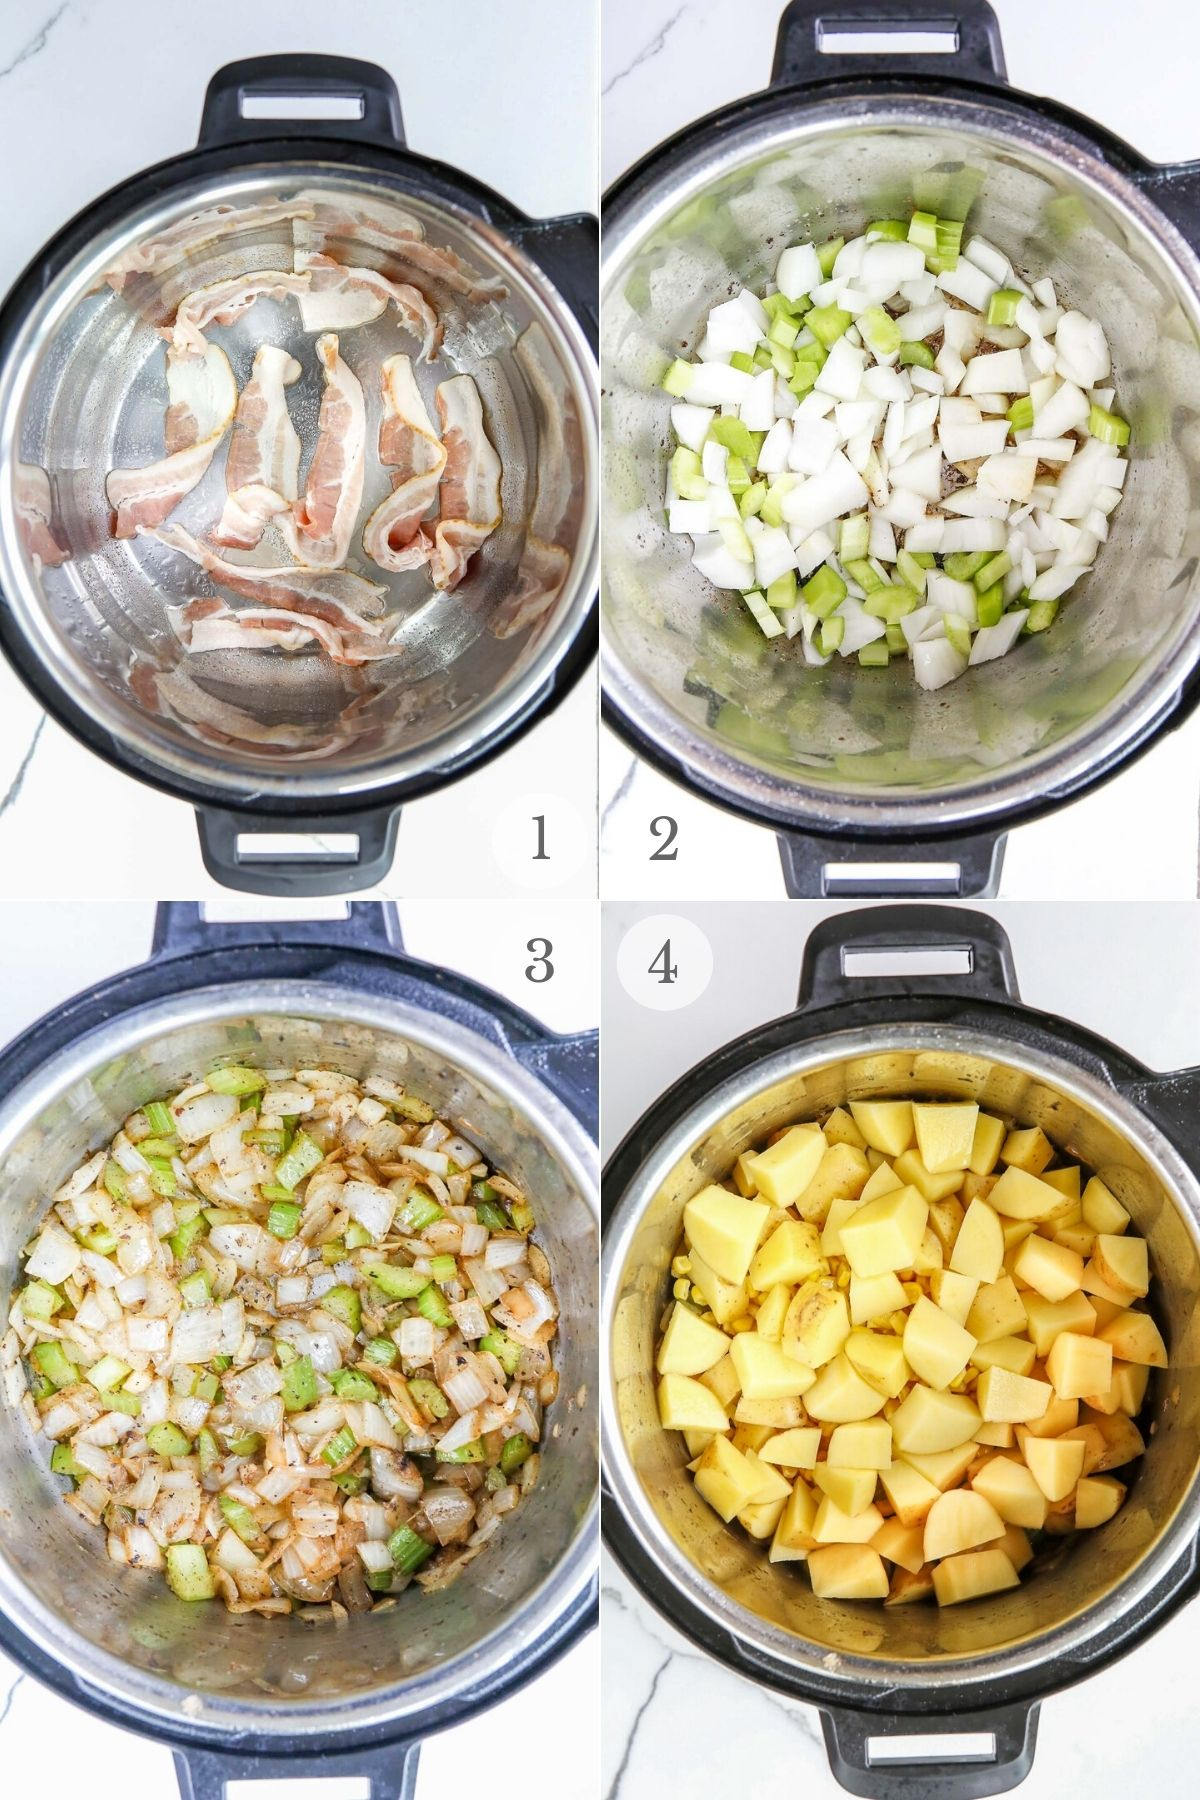 instant pot potato soup recipe steps 1-4